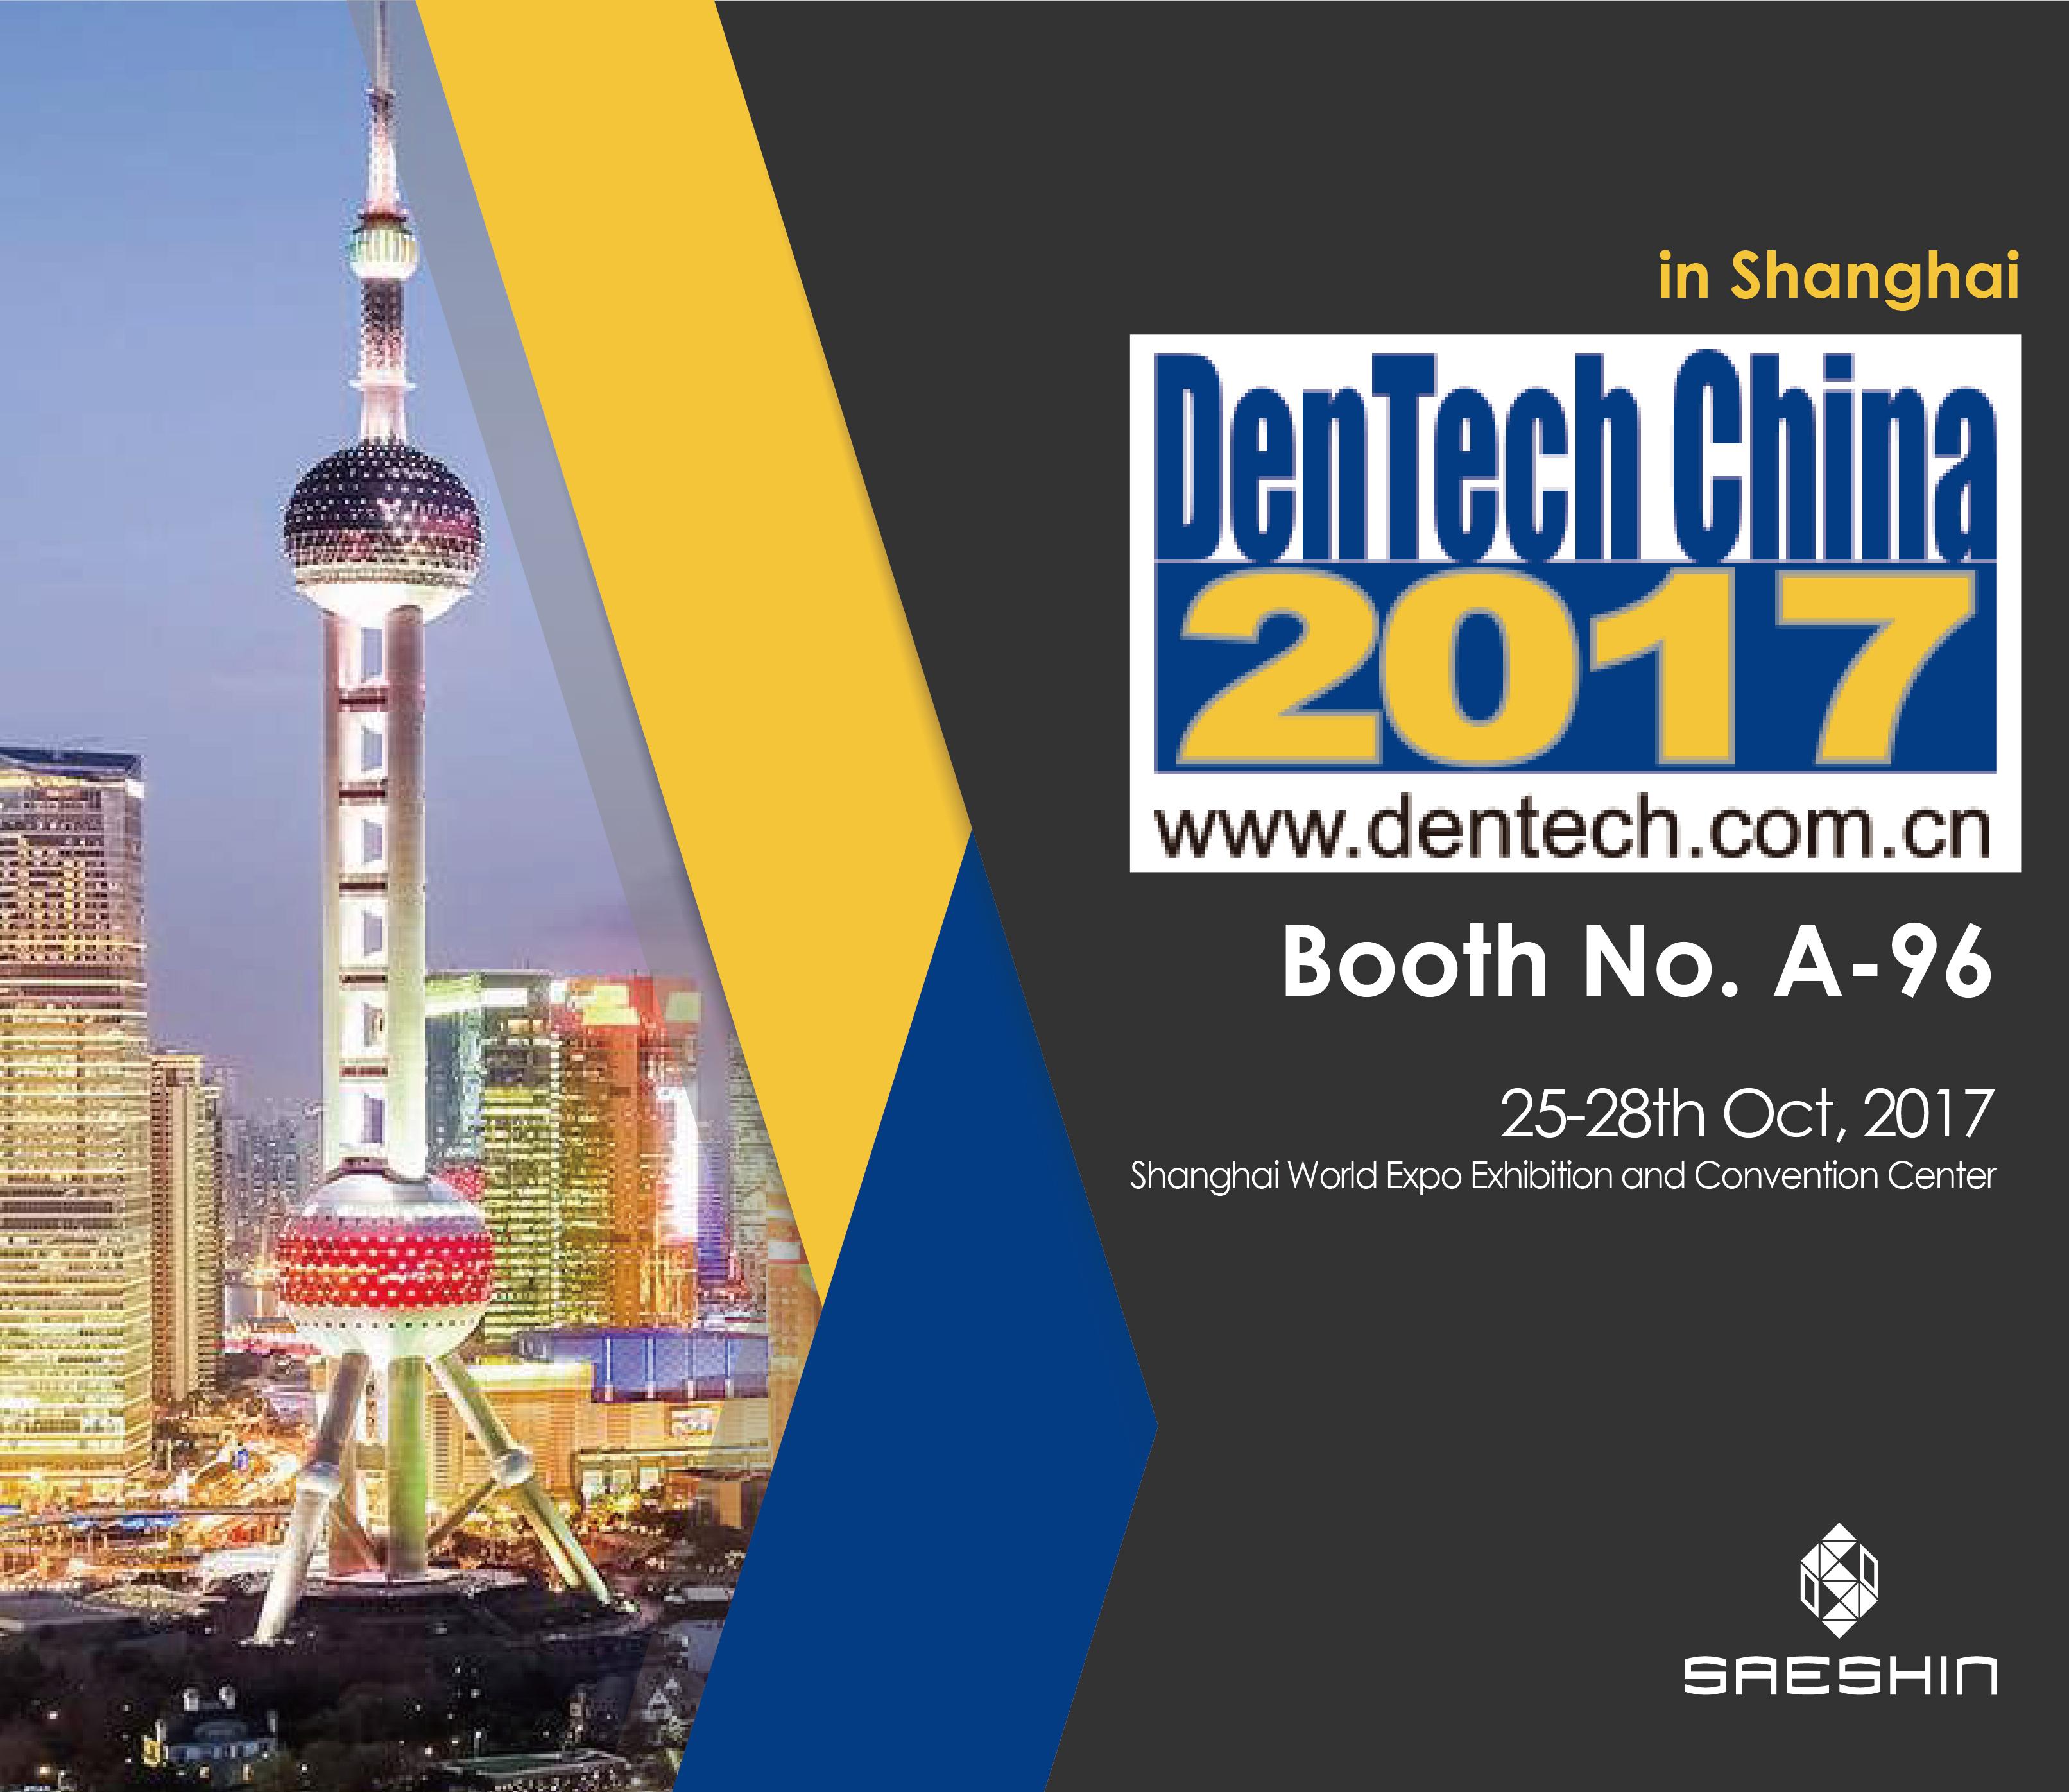 2017 Dentech China.JPG